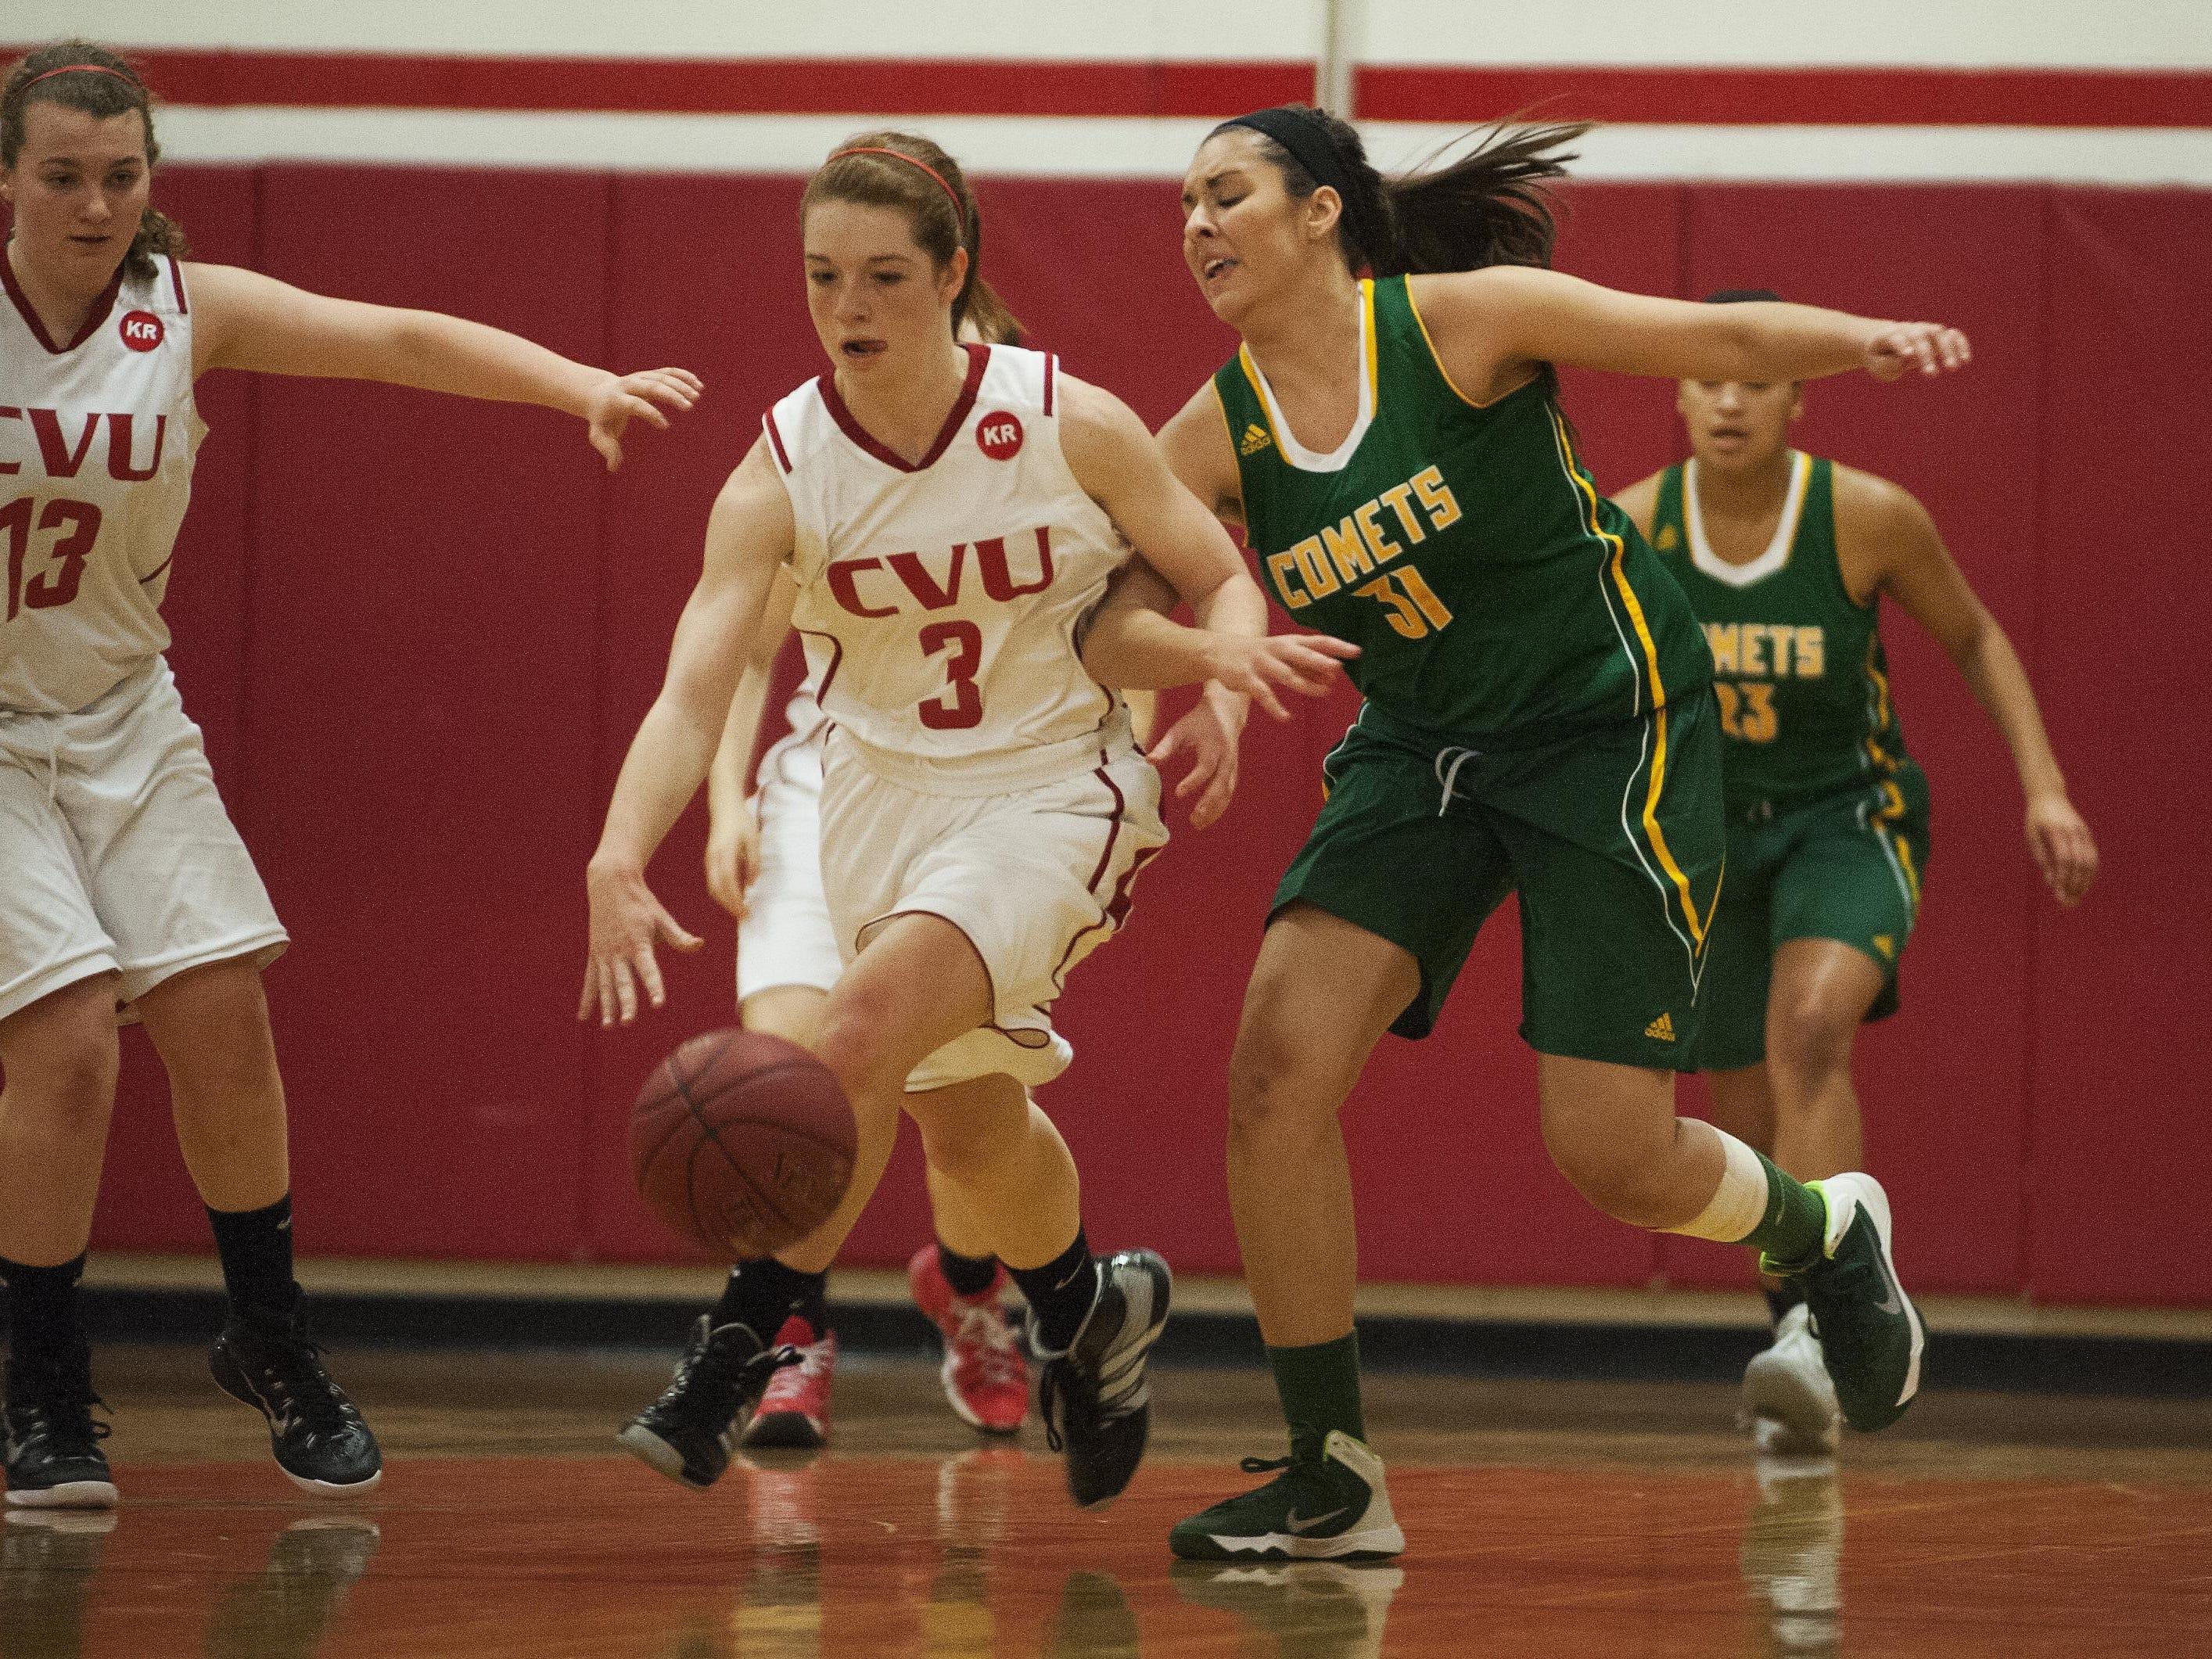 CVU's Sadie Otley (3) gets tangled up during a high school girls basketball game last season